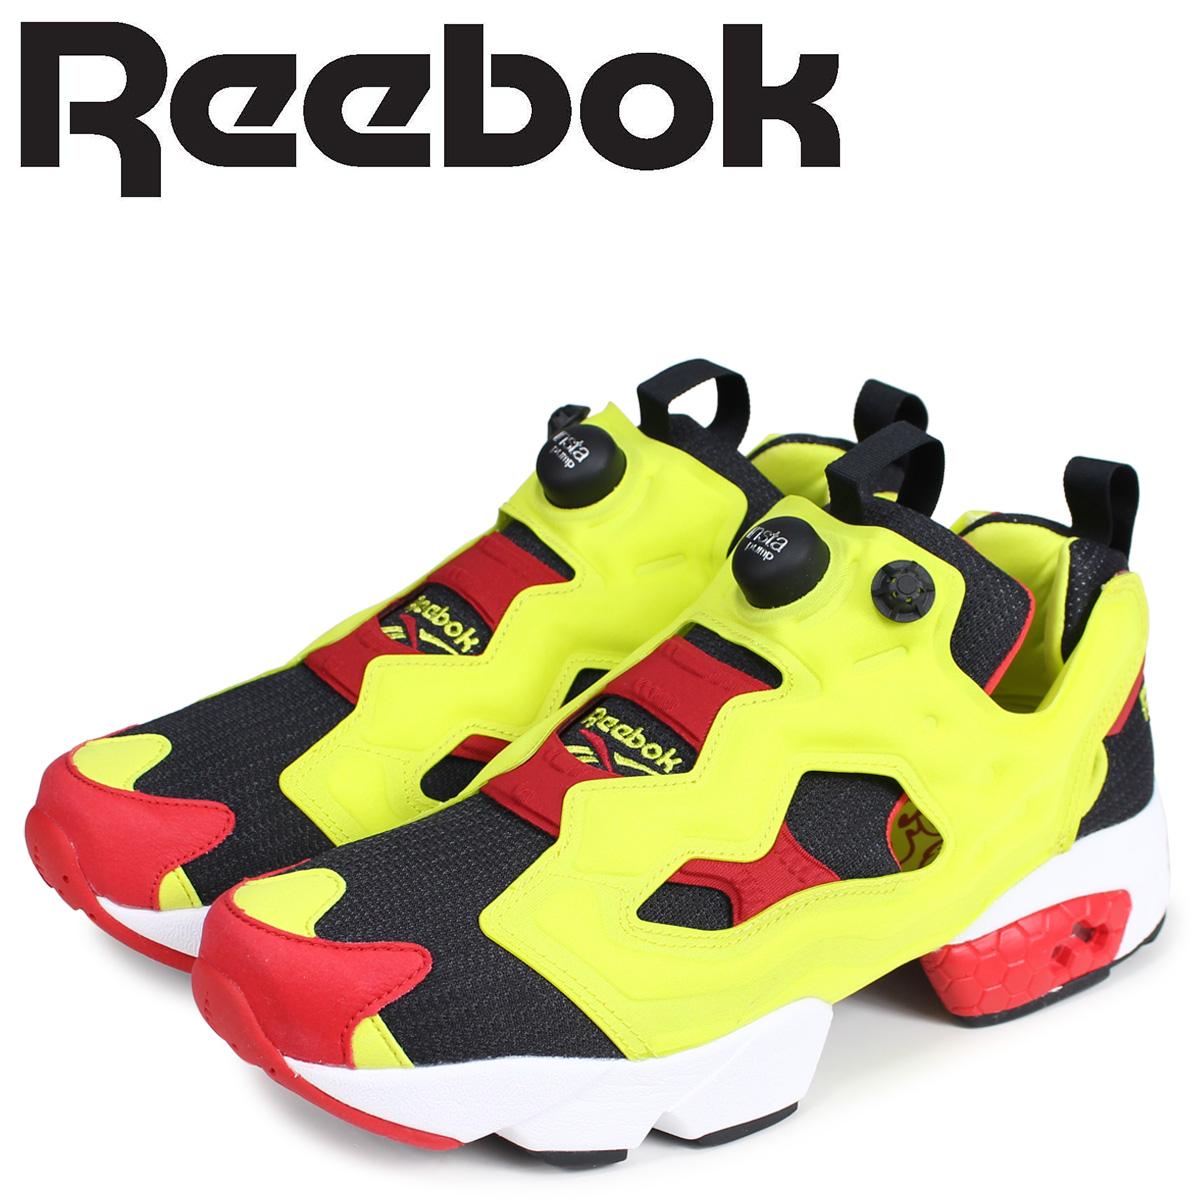 Reebok リーボック インスタ ポンプフューリー シトロン スニーカー メンズ INSTAPUMP FURY OG CITRON ブラック V47514